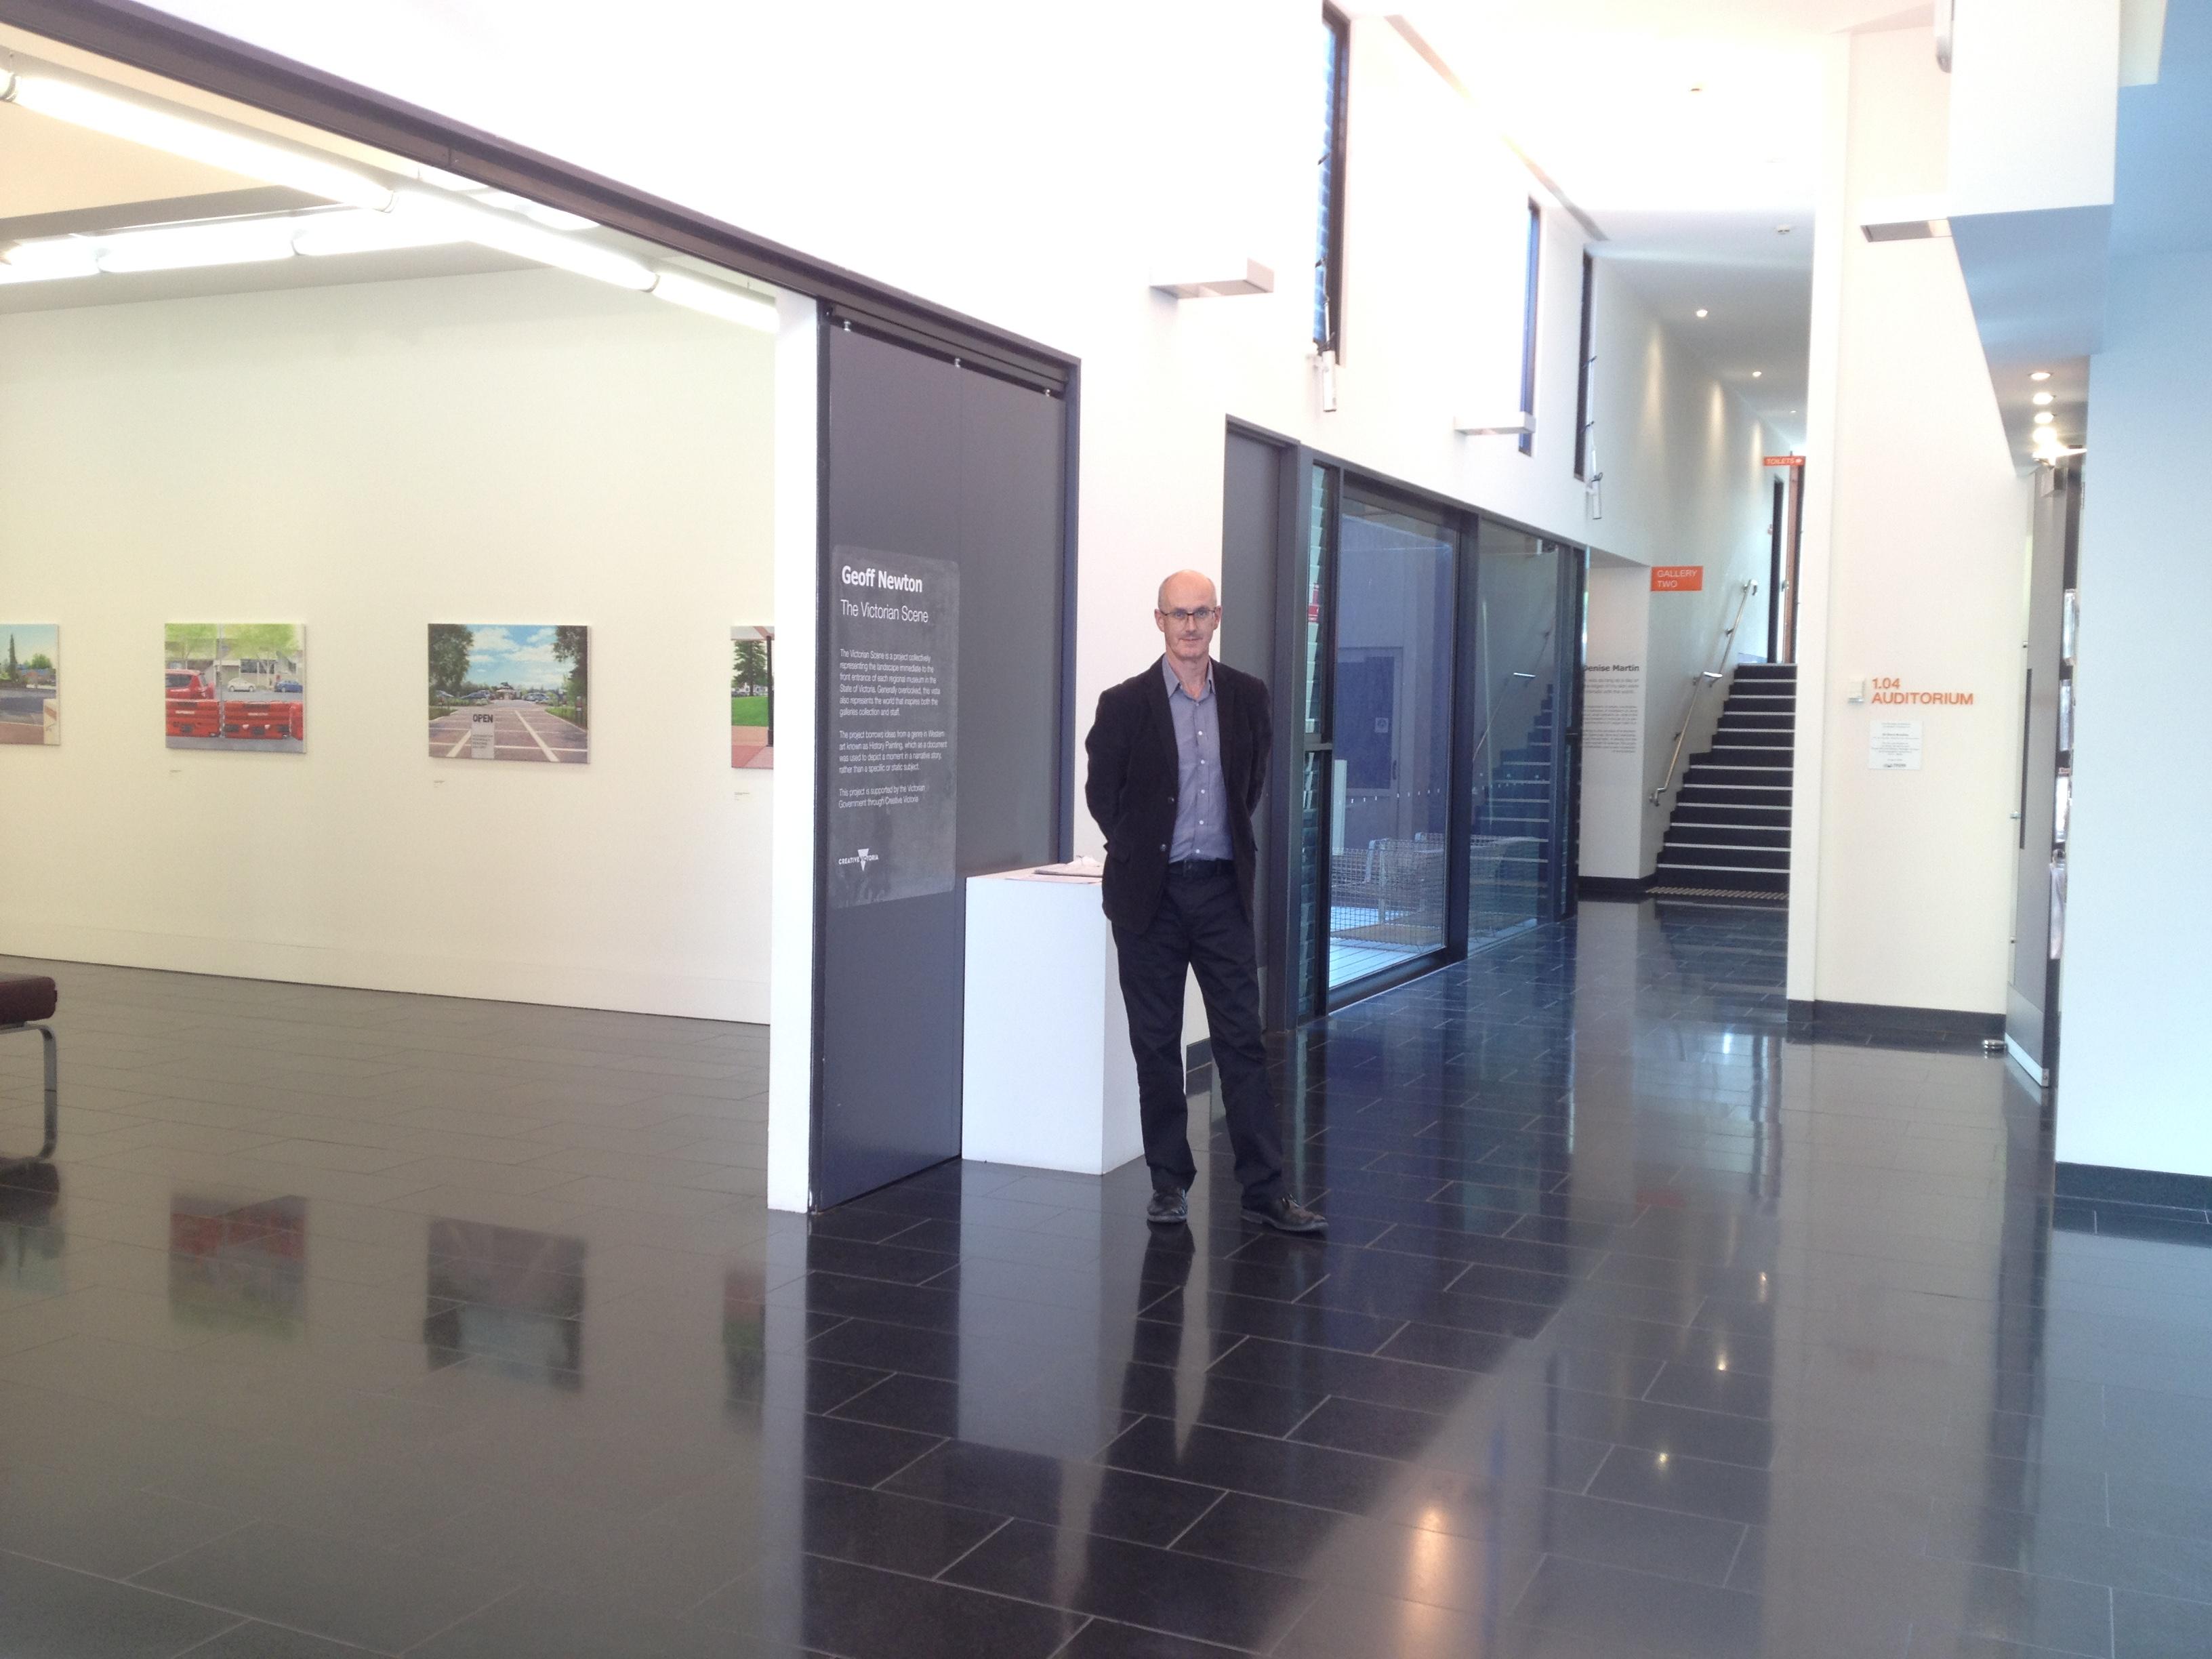 Curator Paul Northam at VAC, La Trobe University in Bendigo 10.12.2015 © Cultural Documents